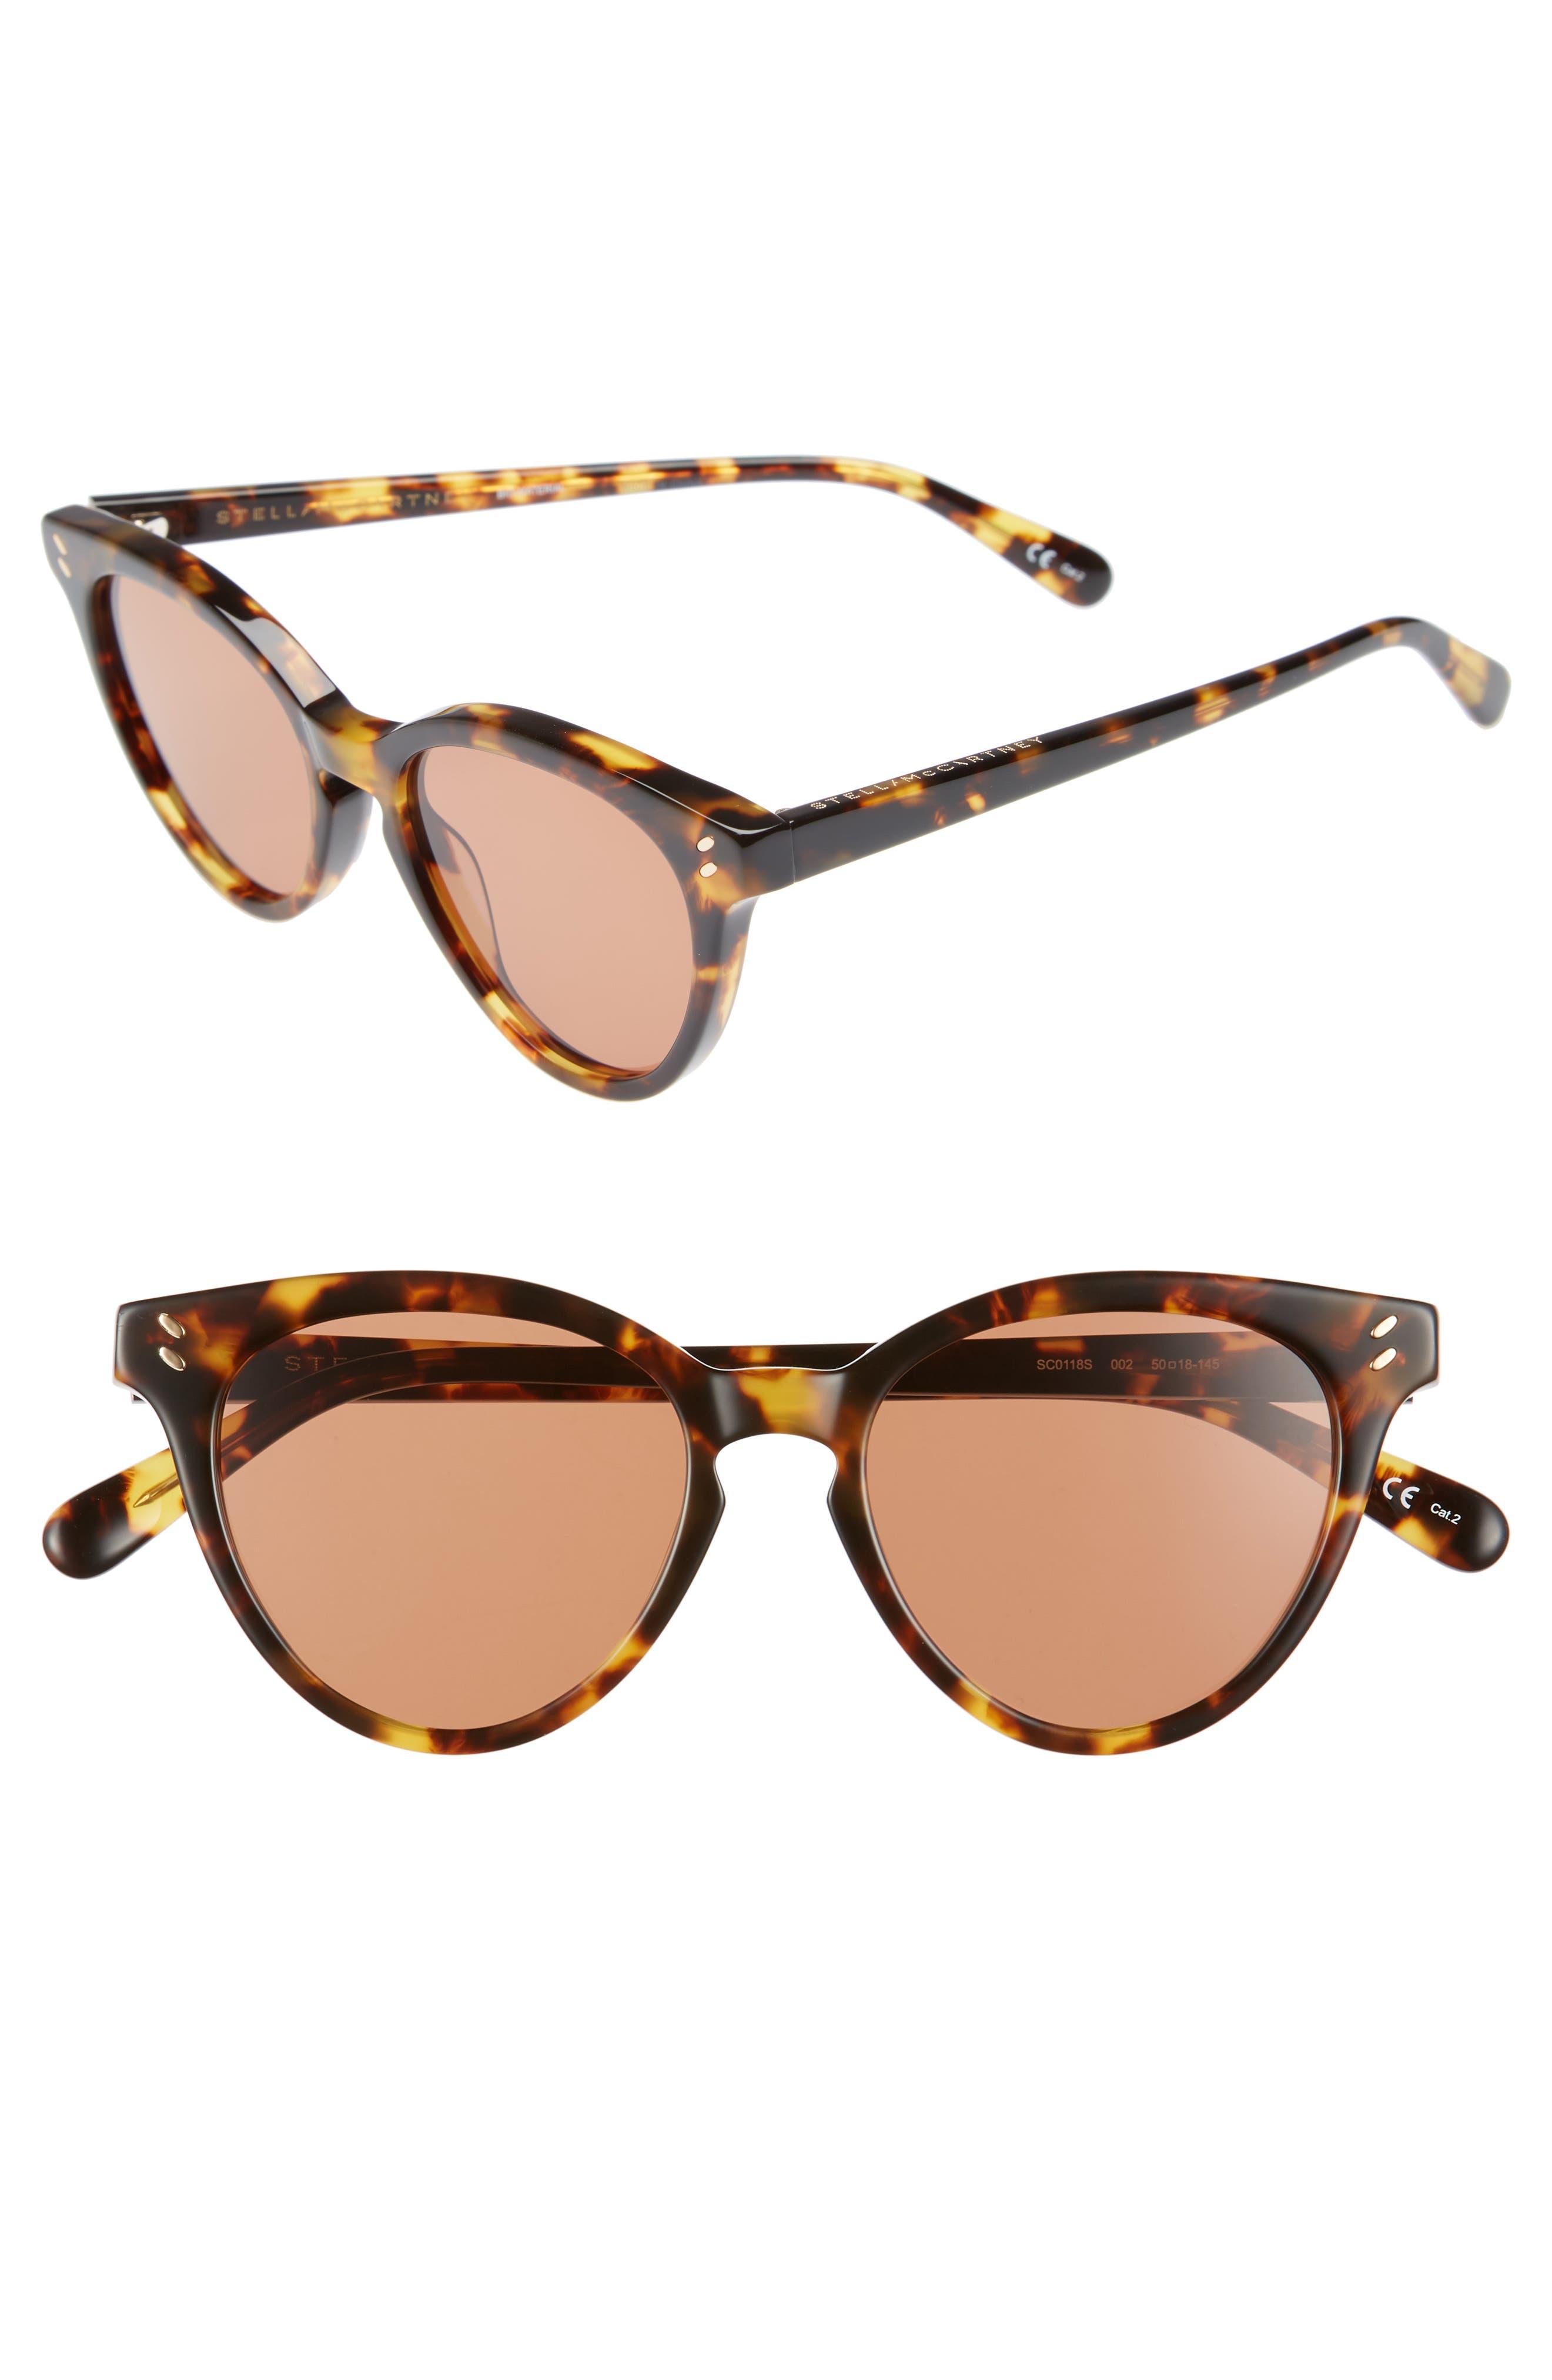 50mm Round Sunglasses,                             Main thumbnail 1, color,                             Medium Havana